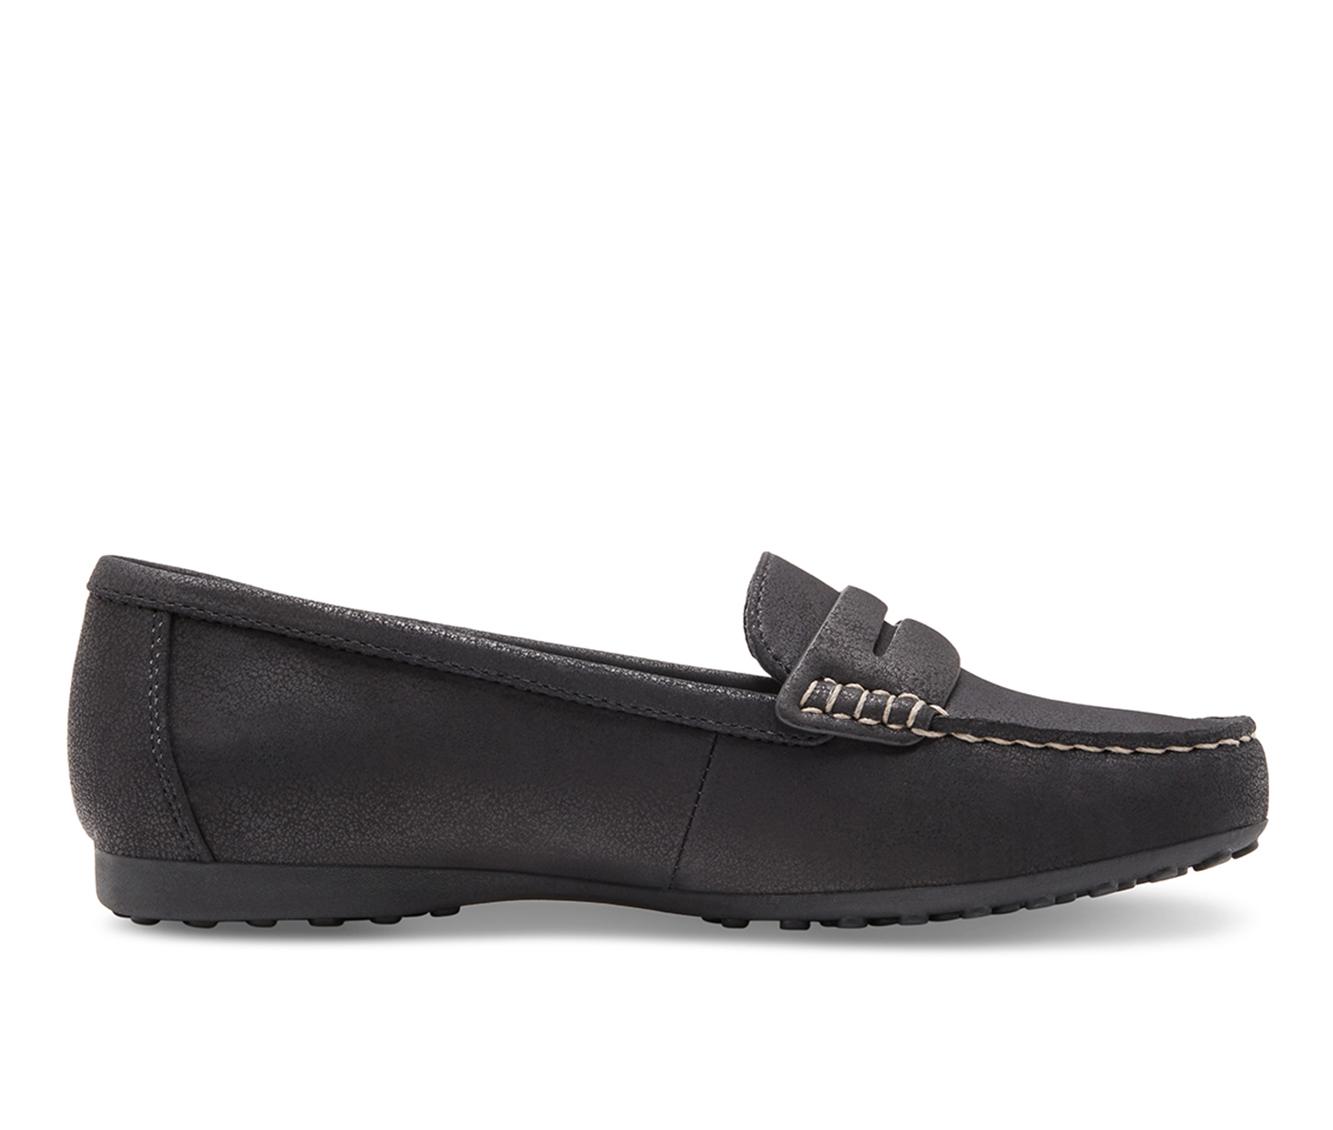 Eastland Montana Women's Shoe (Black Faux Leather)